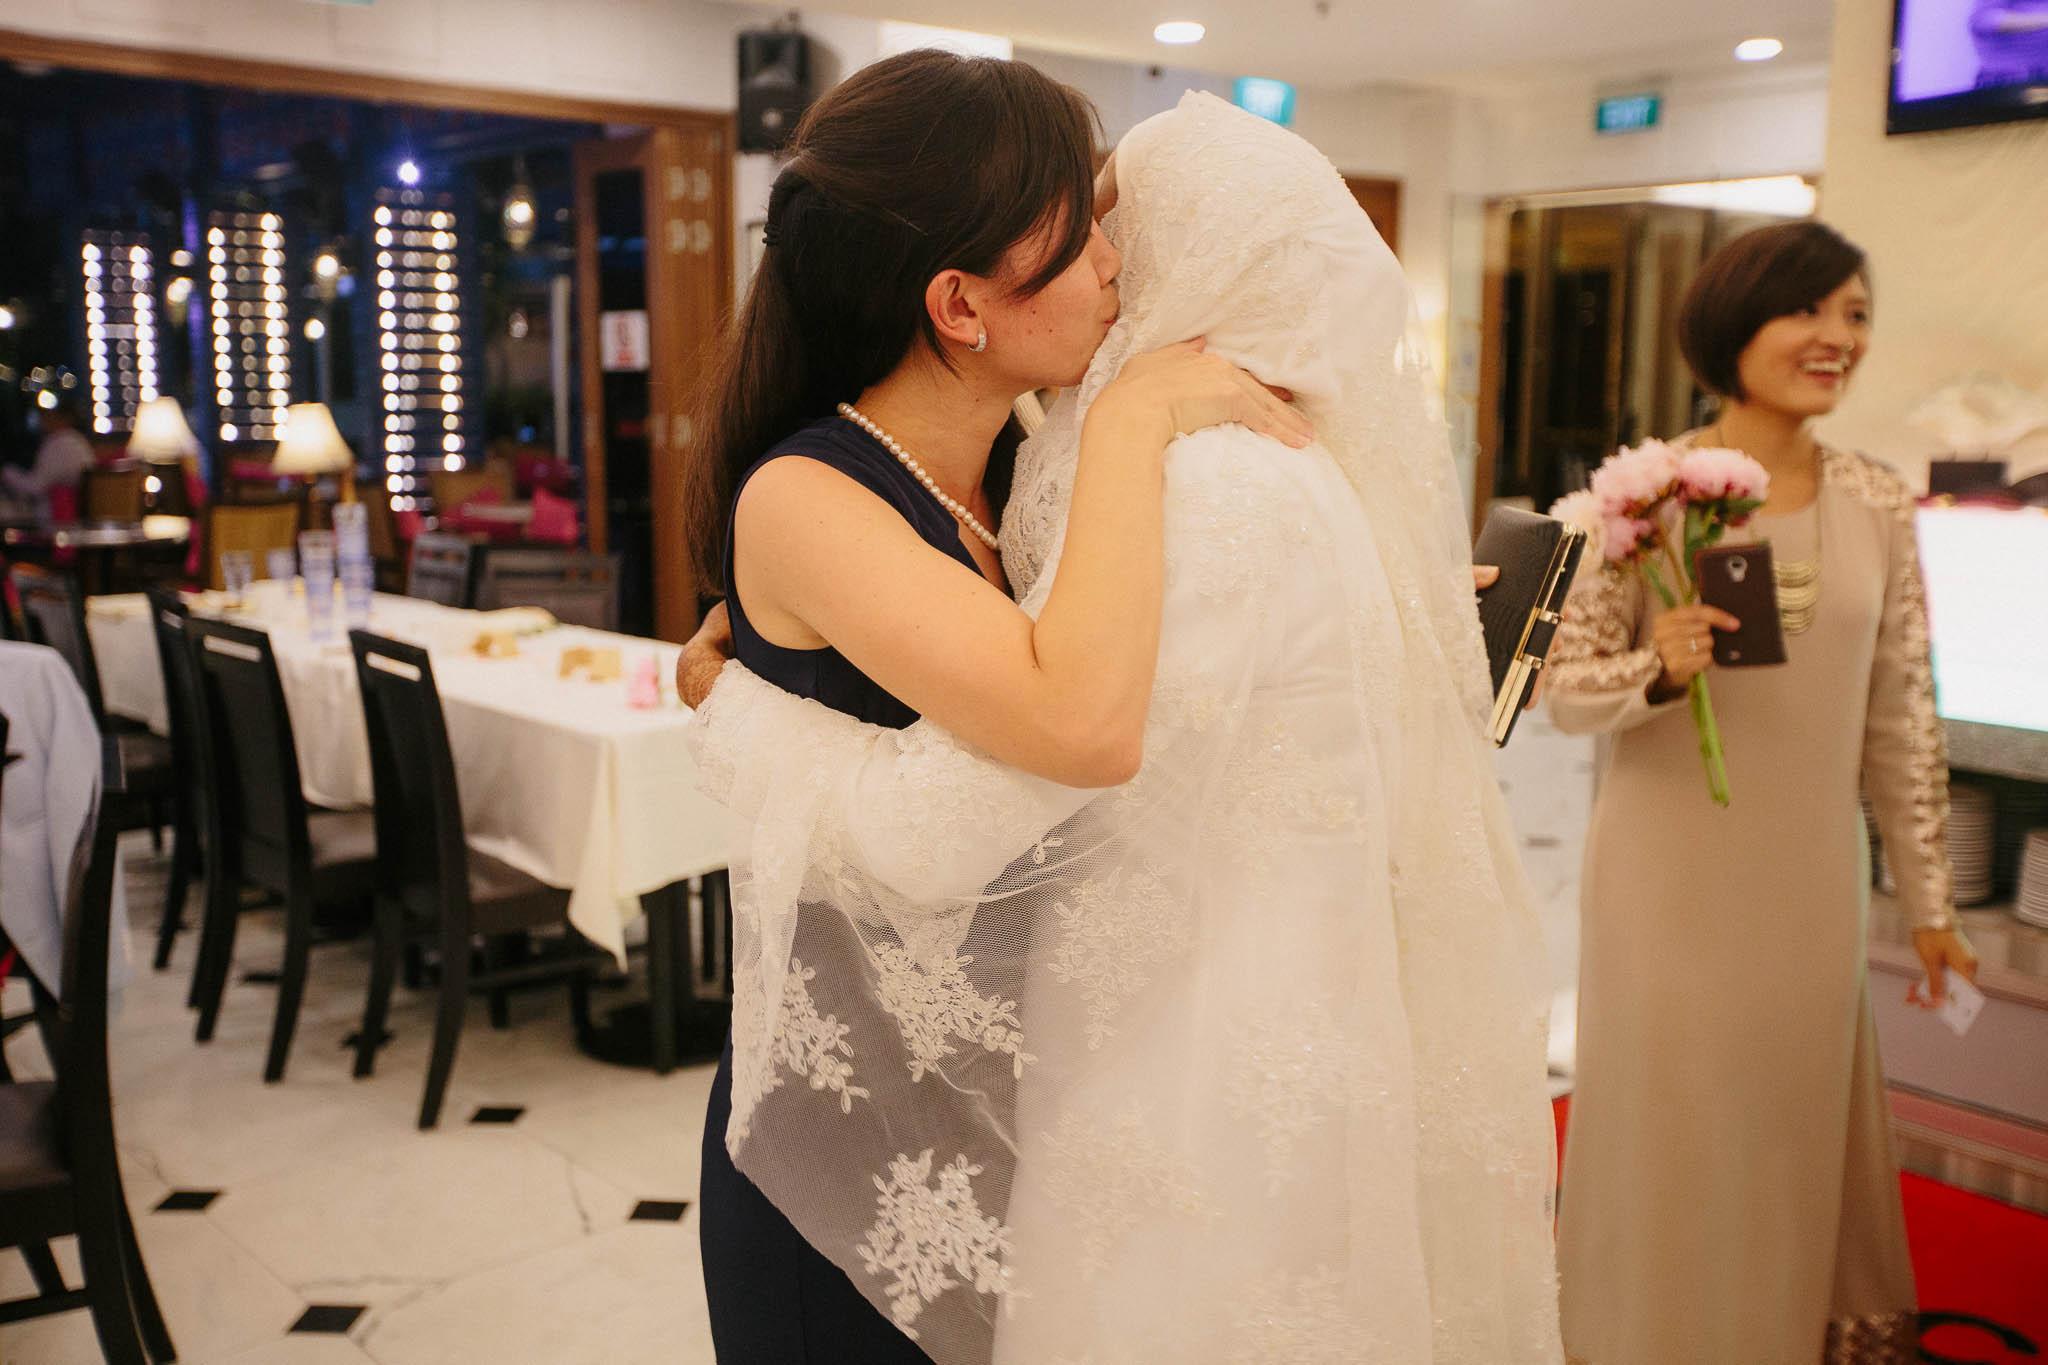 singapore-wedding-photographer-malay-indian-pre-wedding-travel-wmt-2015-shereen-farid-69.jpg